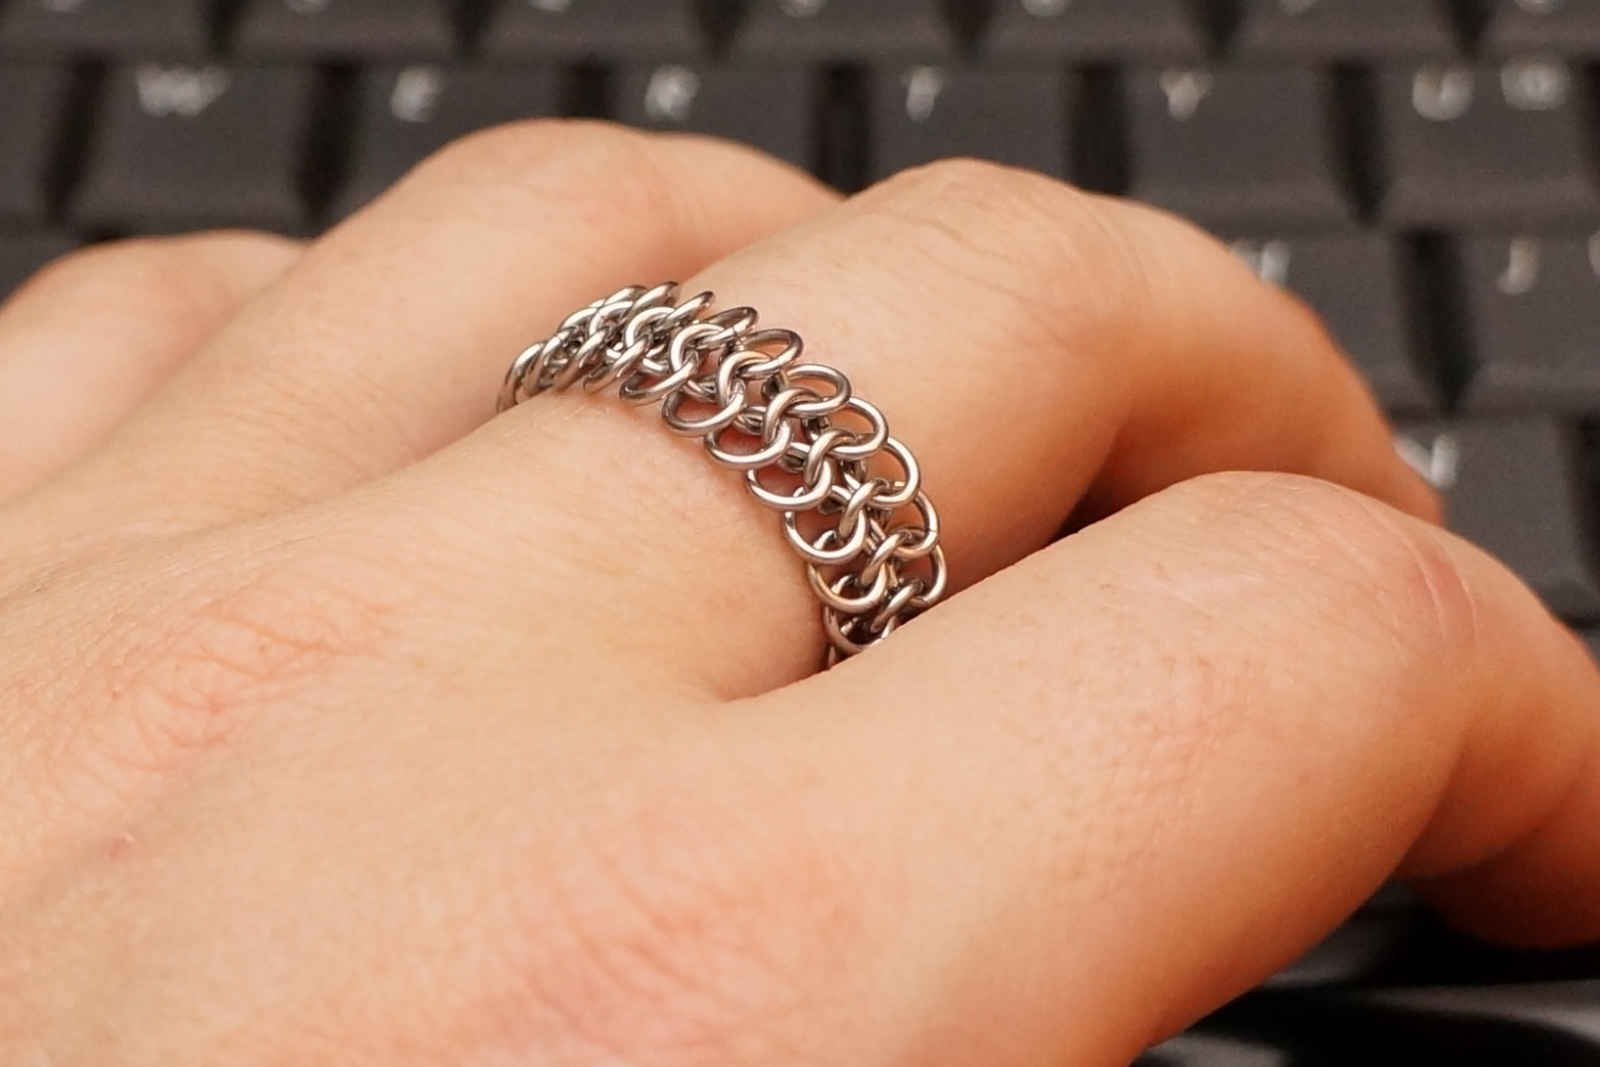 My New ring